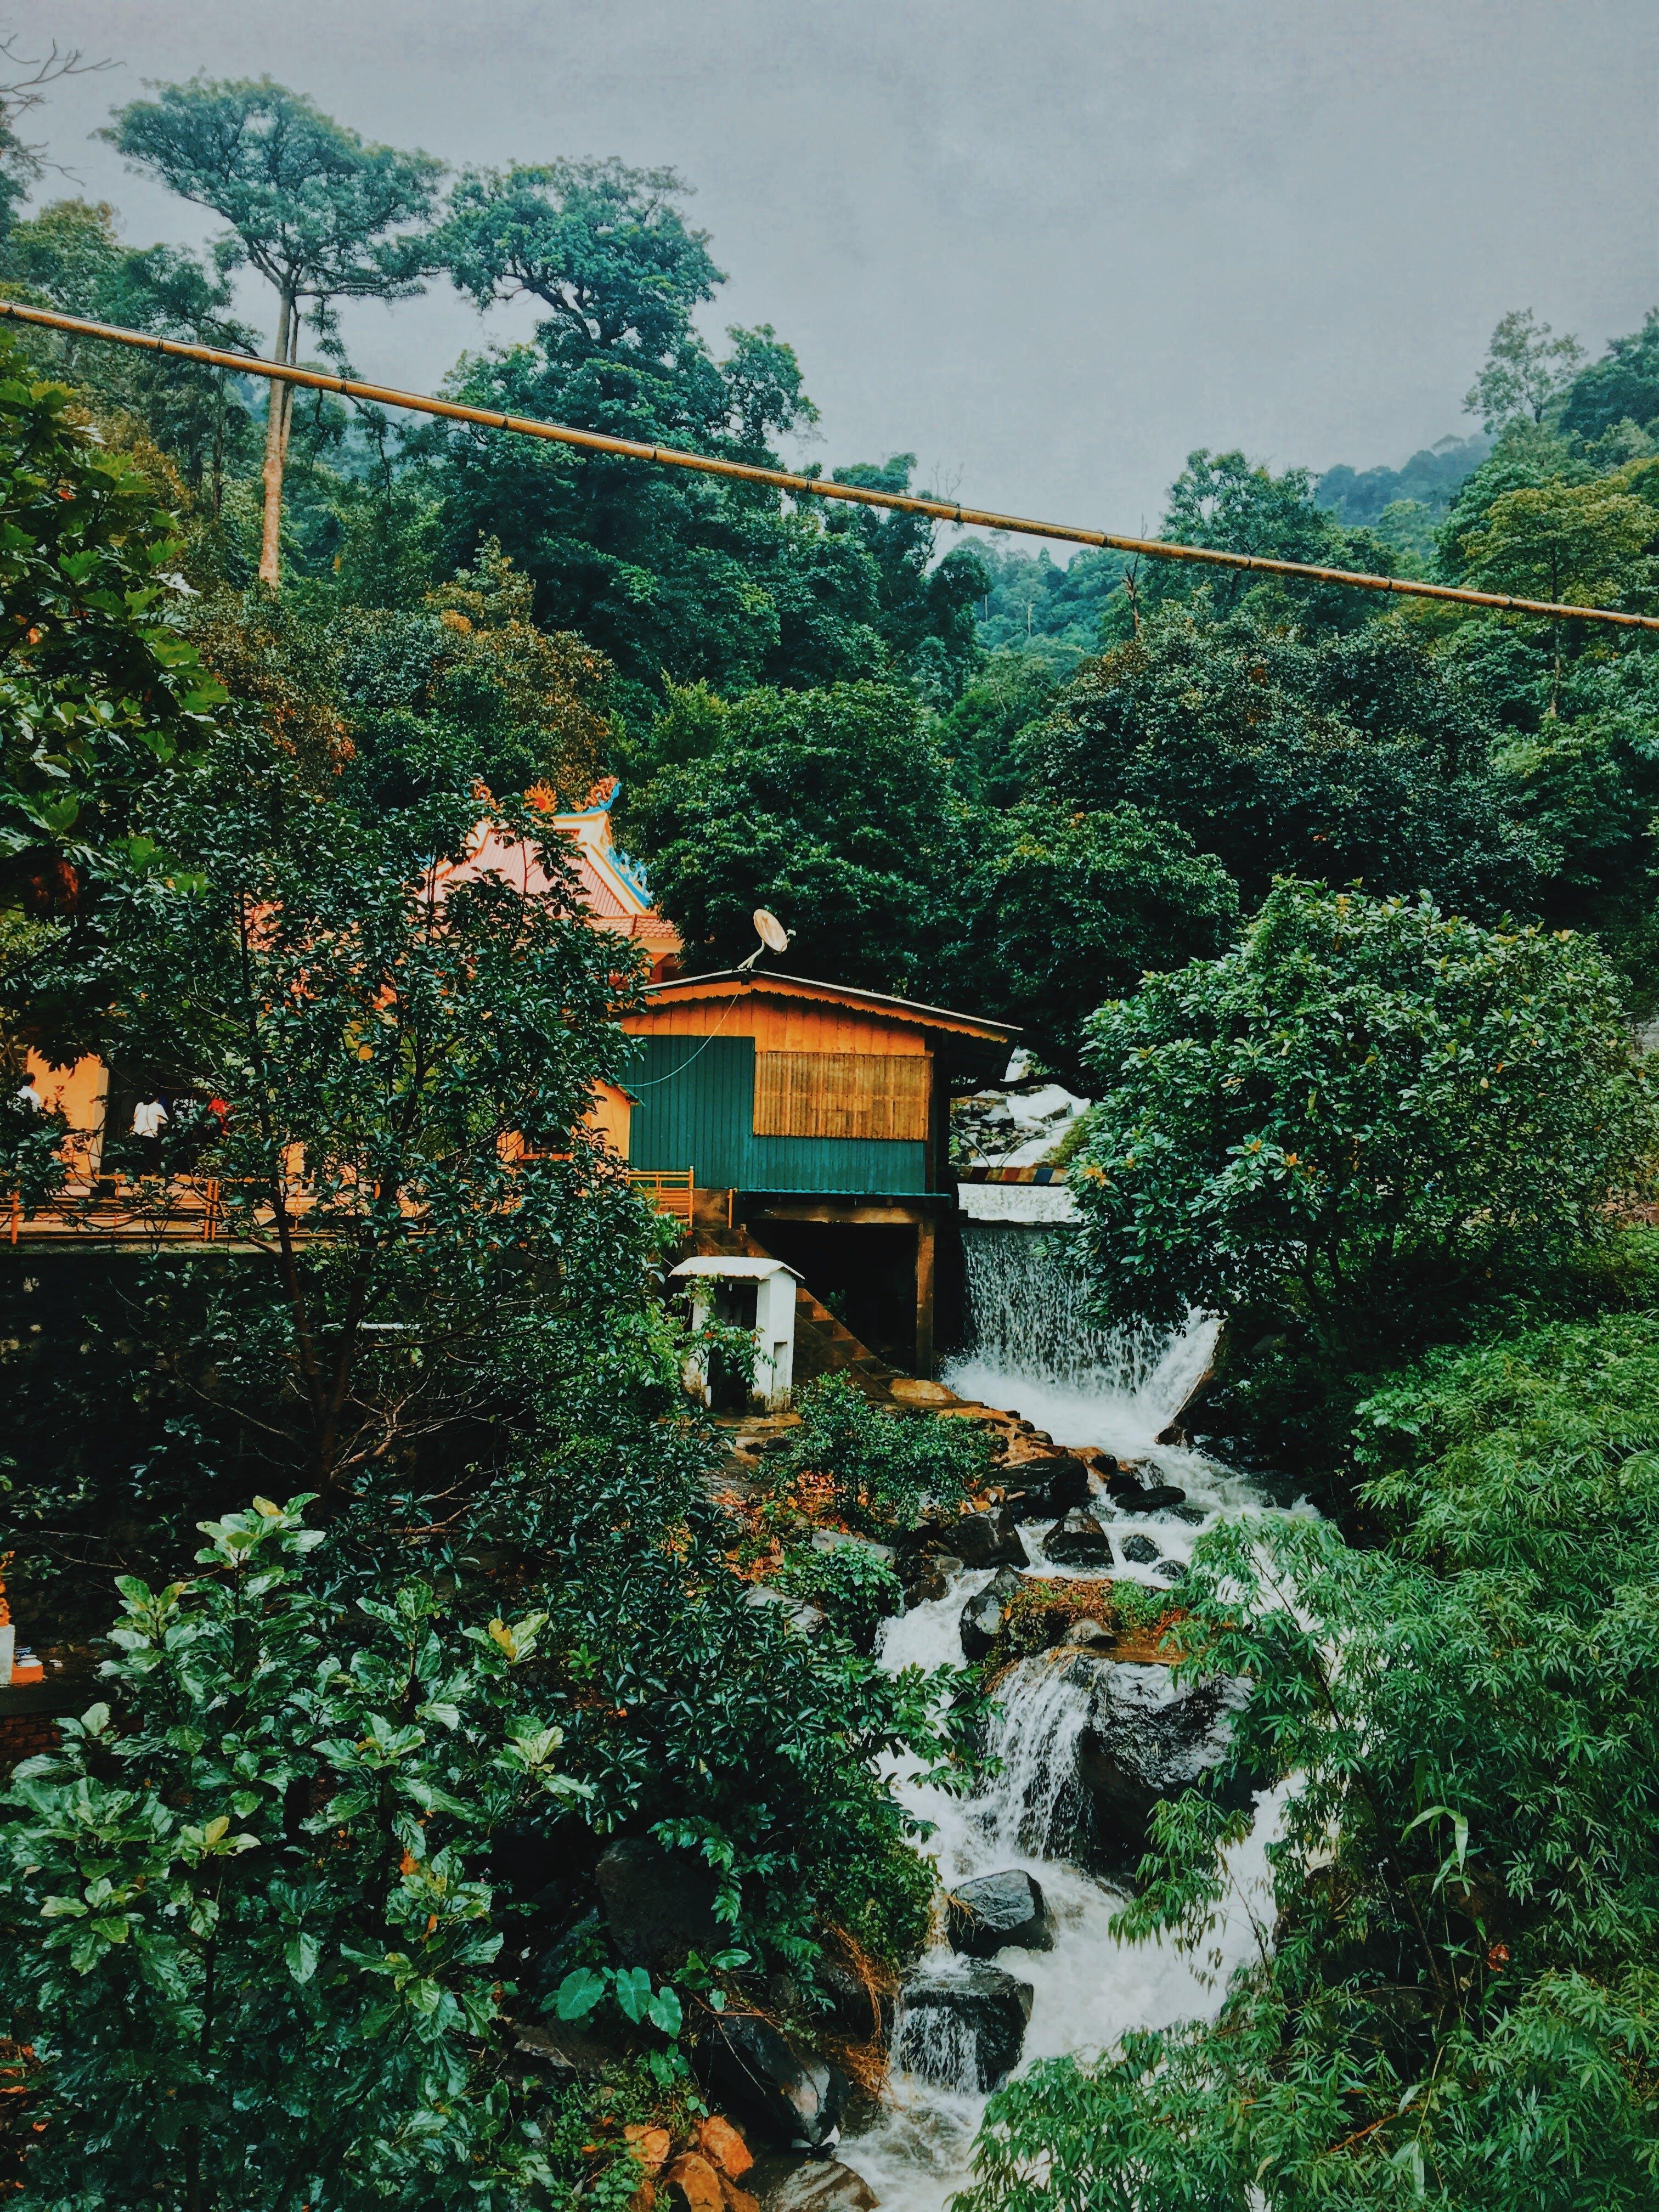 Kostenloses Stock Foto zu architektur, bäume, brücke, felsen